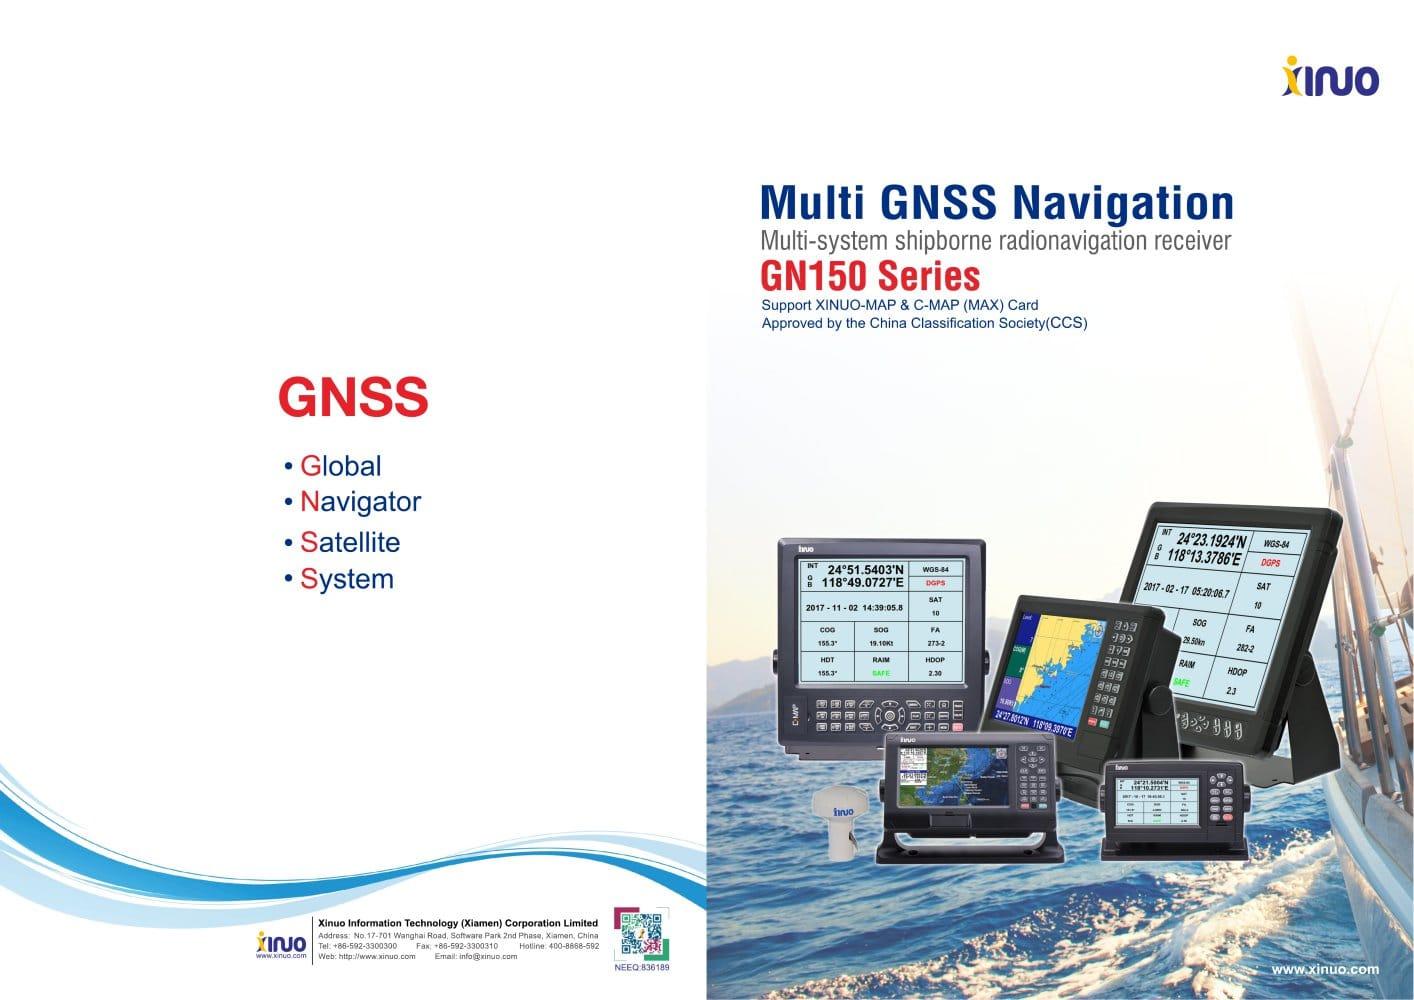 GN150 Multi GNSS Navigation - Xinuo Information Technology (Xiamen